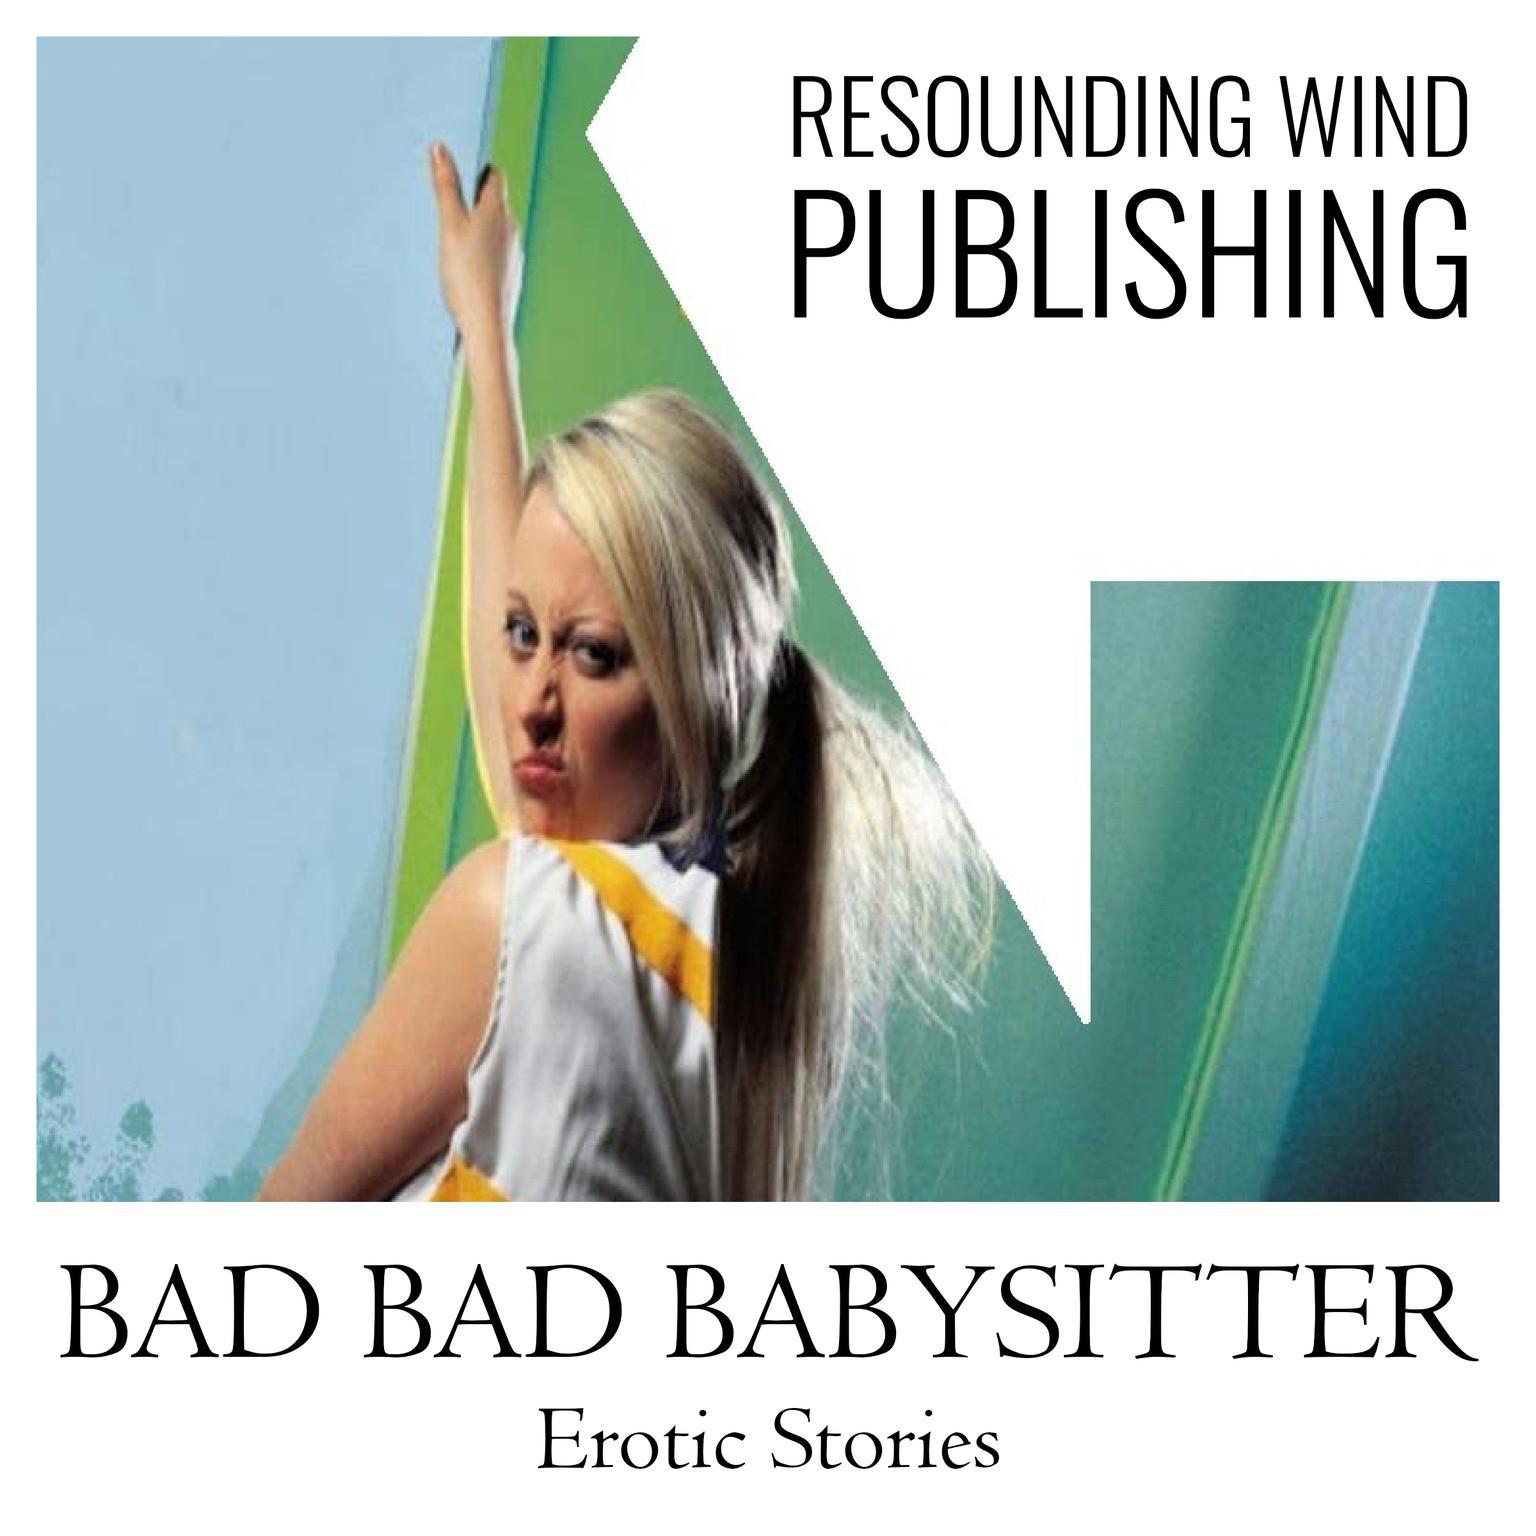 Bad Bad Babysitter Erotic Stories  Audiobook, by Torri Tumbles